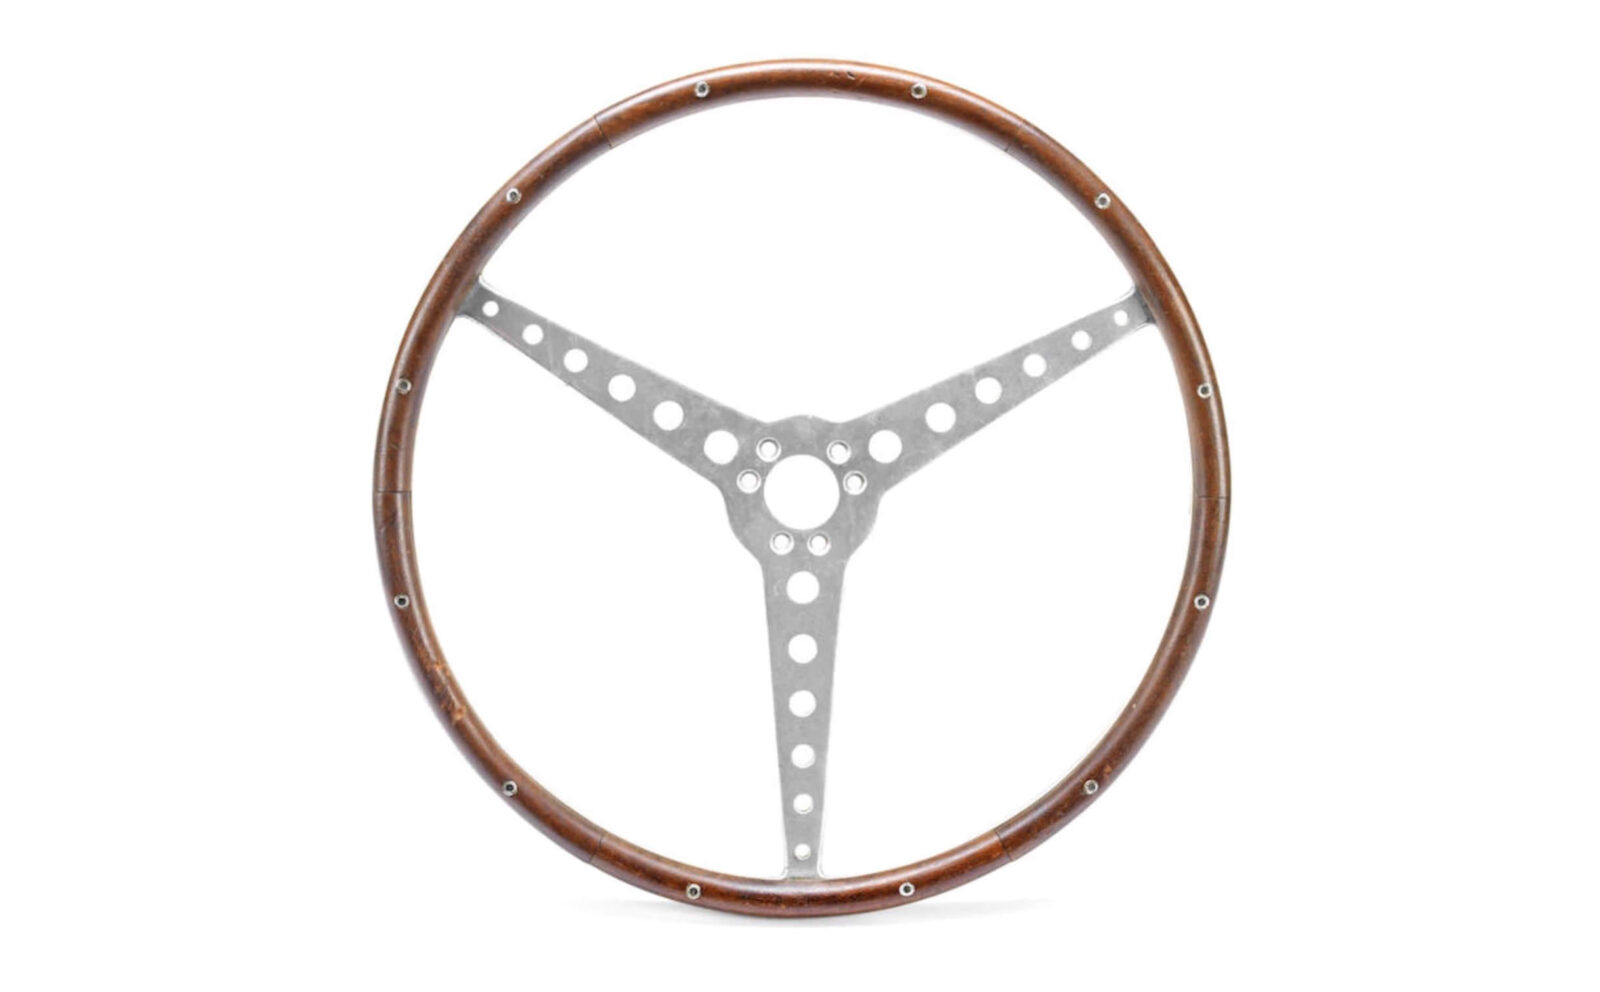 Juan Manuel Fangios Steering Wheel 1 1600x992 - Juan Manuel Fangio's Steering Wheel